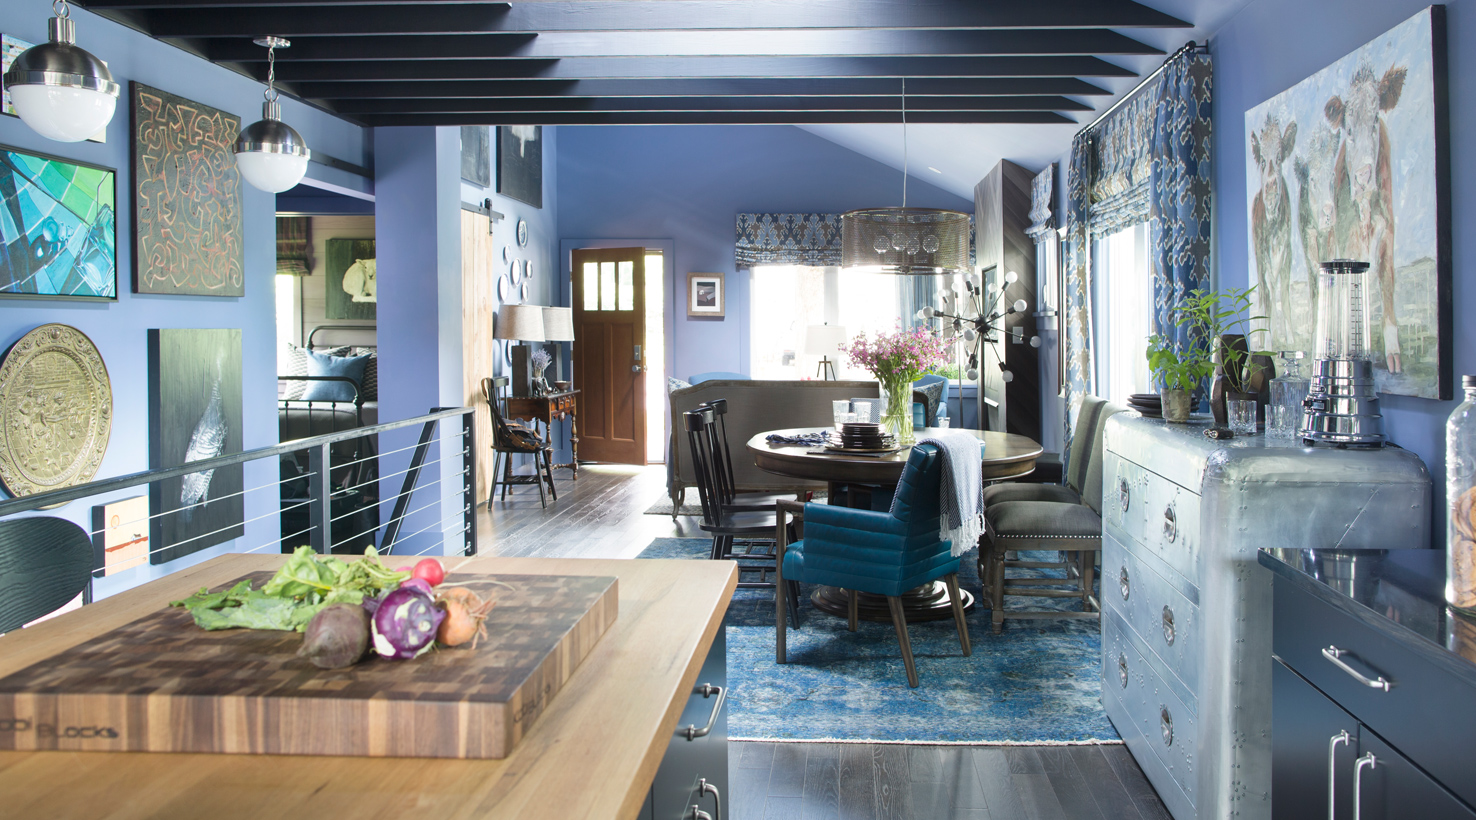 Hgtv Bedroom Colors